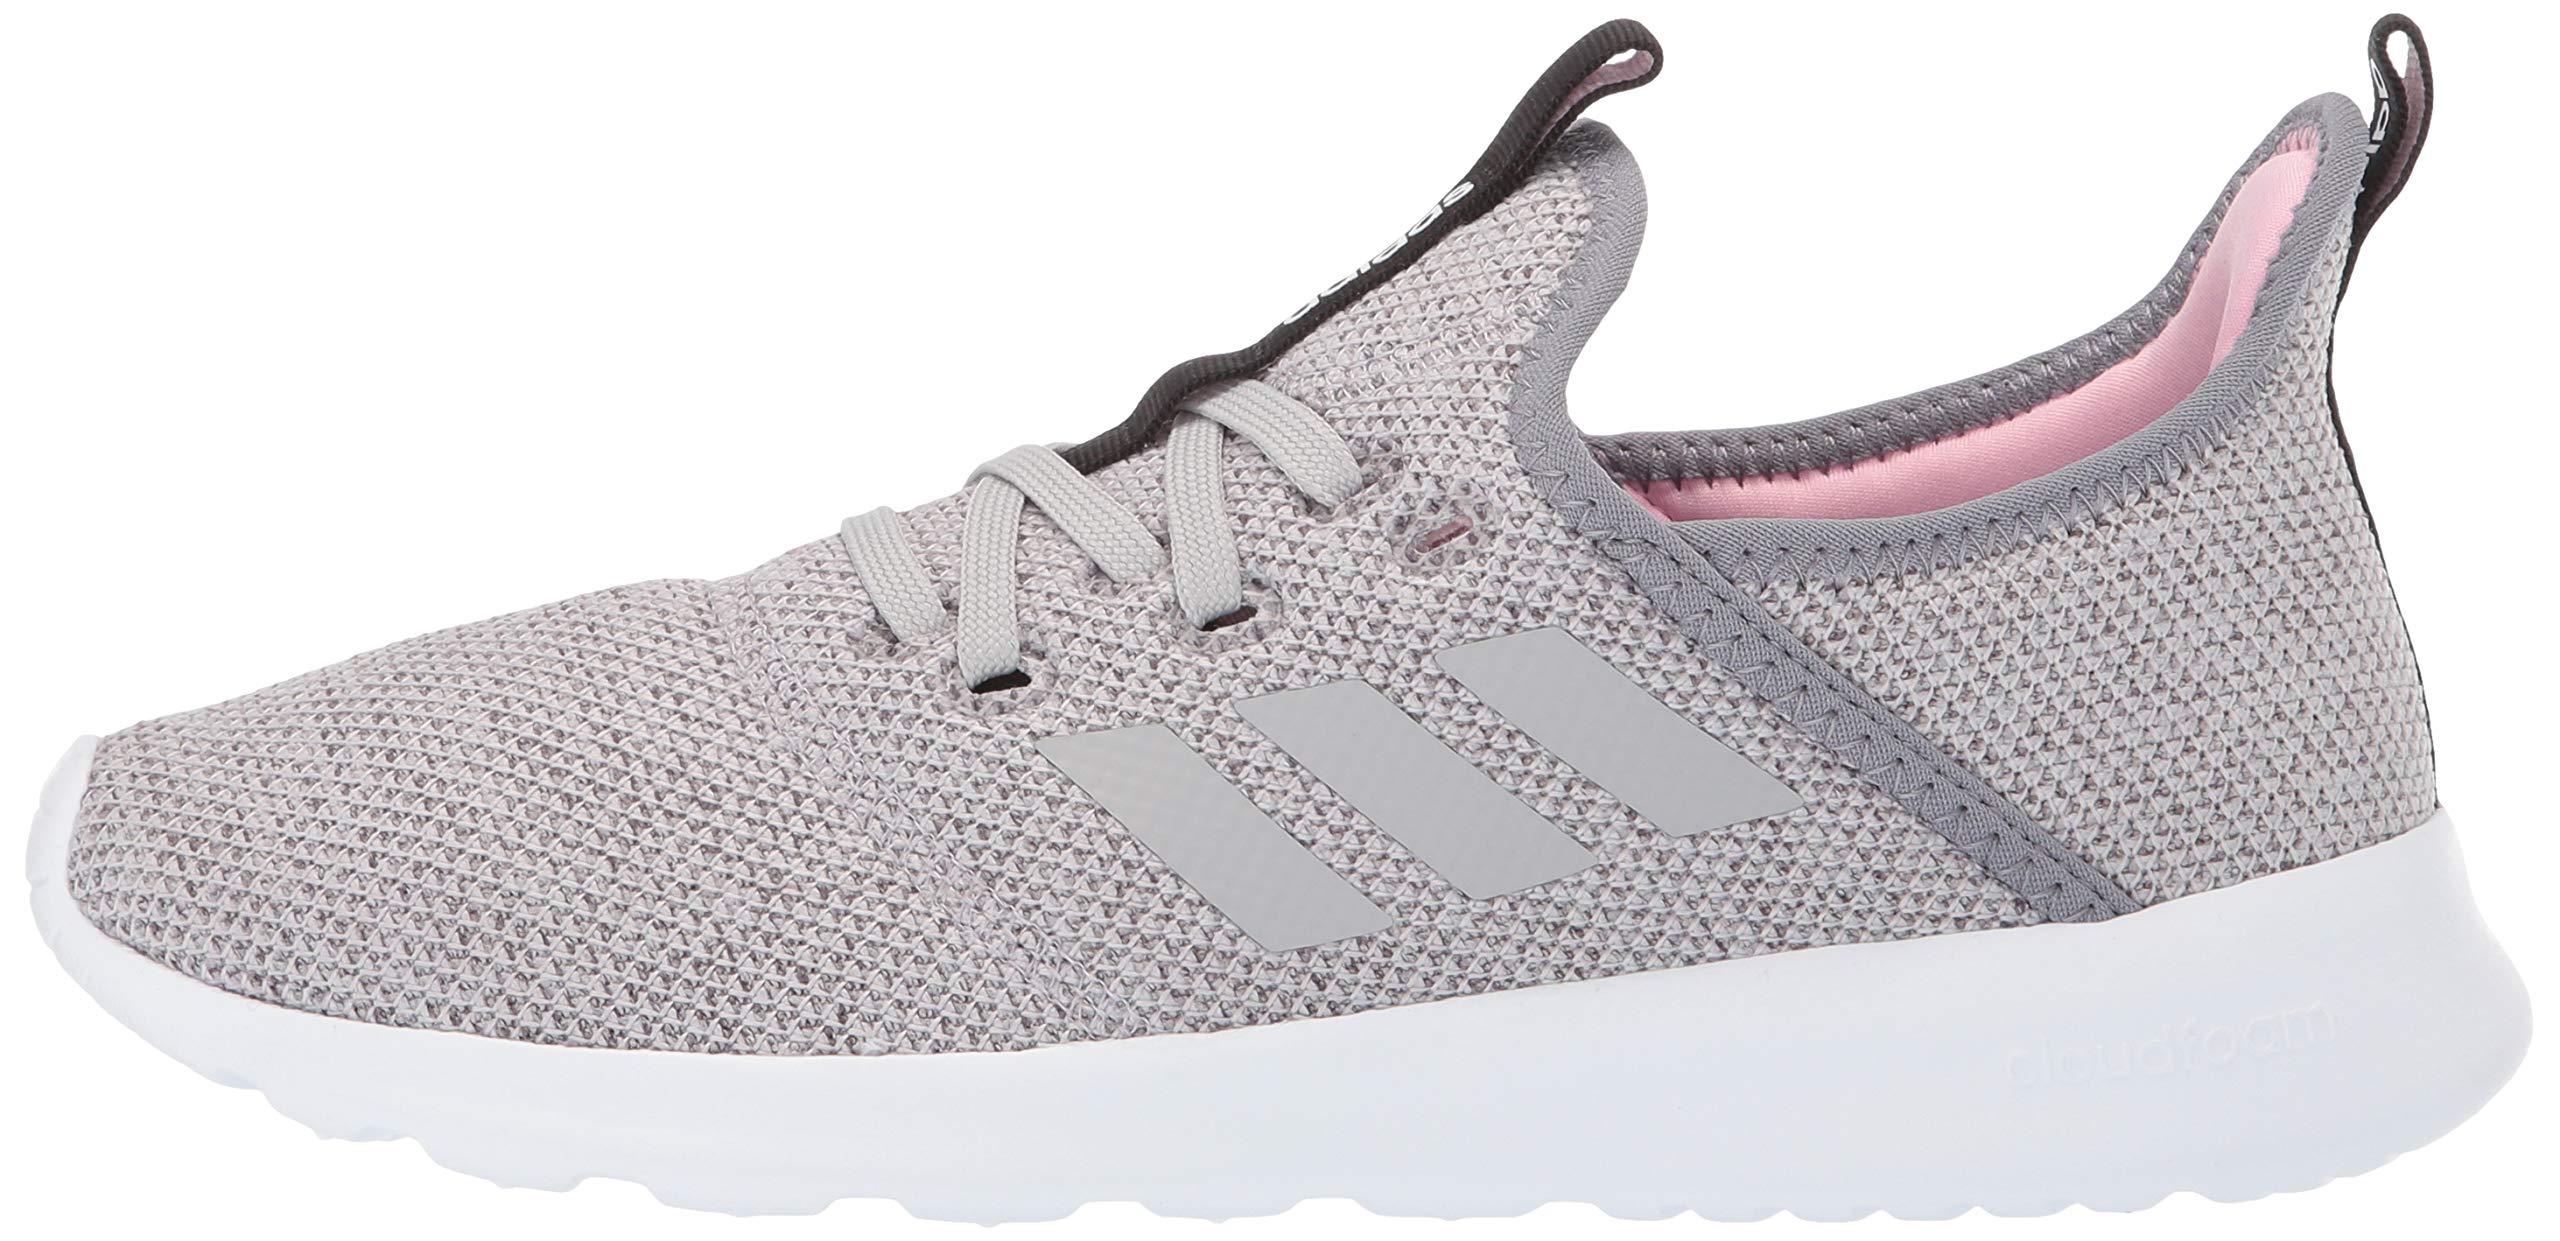 adidas Women's Cloudfoam Pure, Grey/True Pink, 5.5 M US by adidas (Image #5)